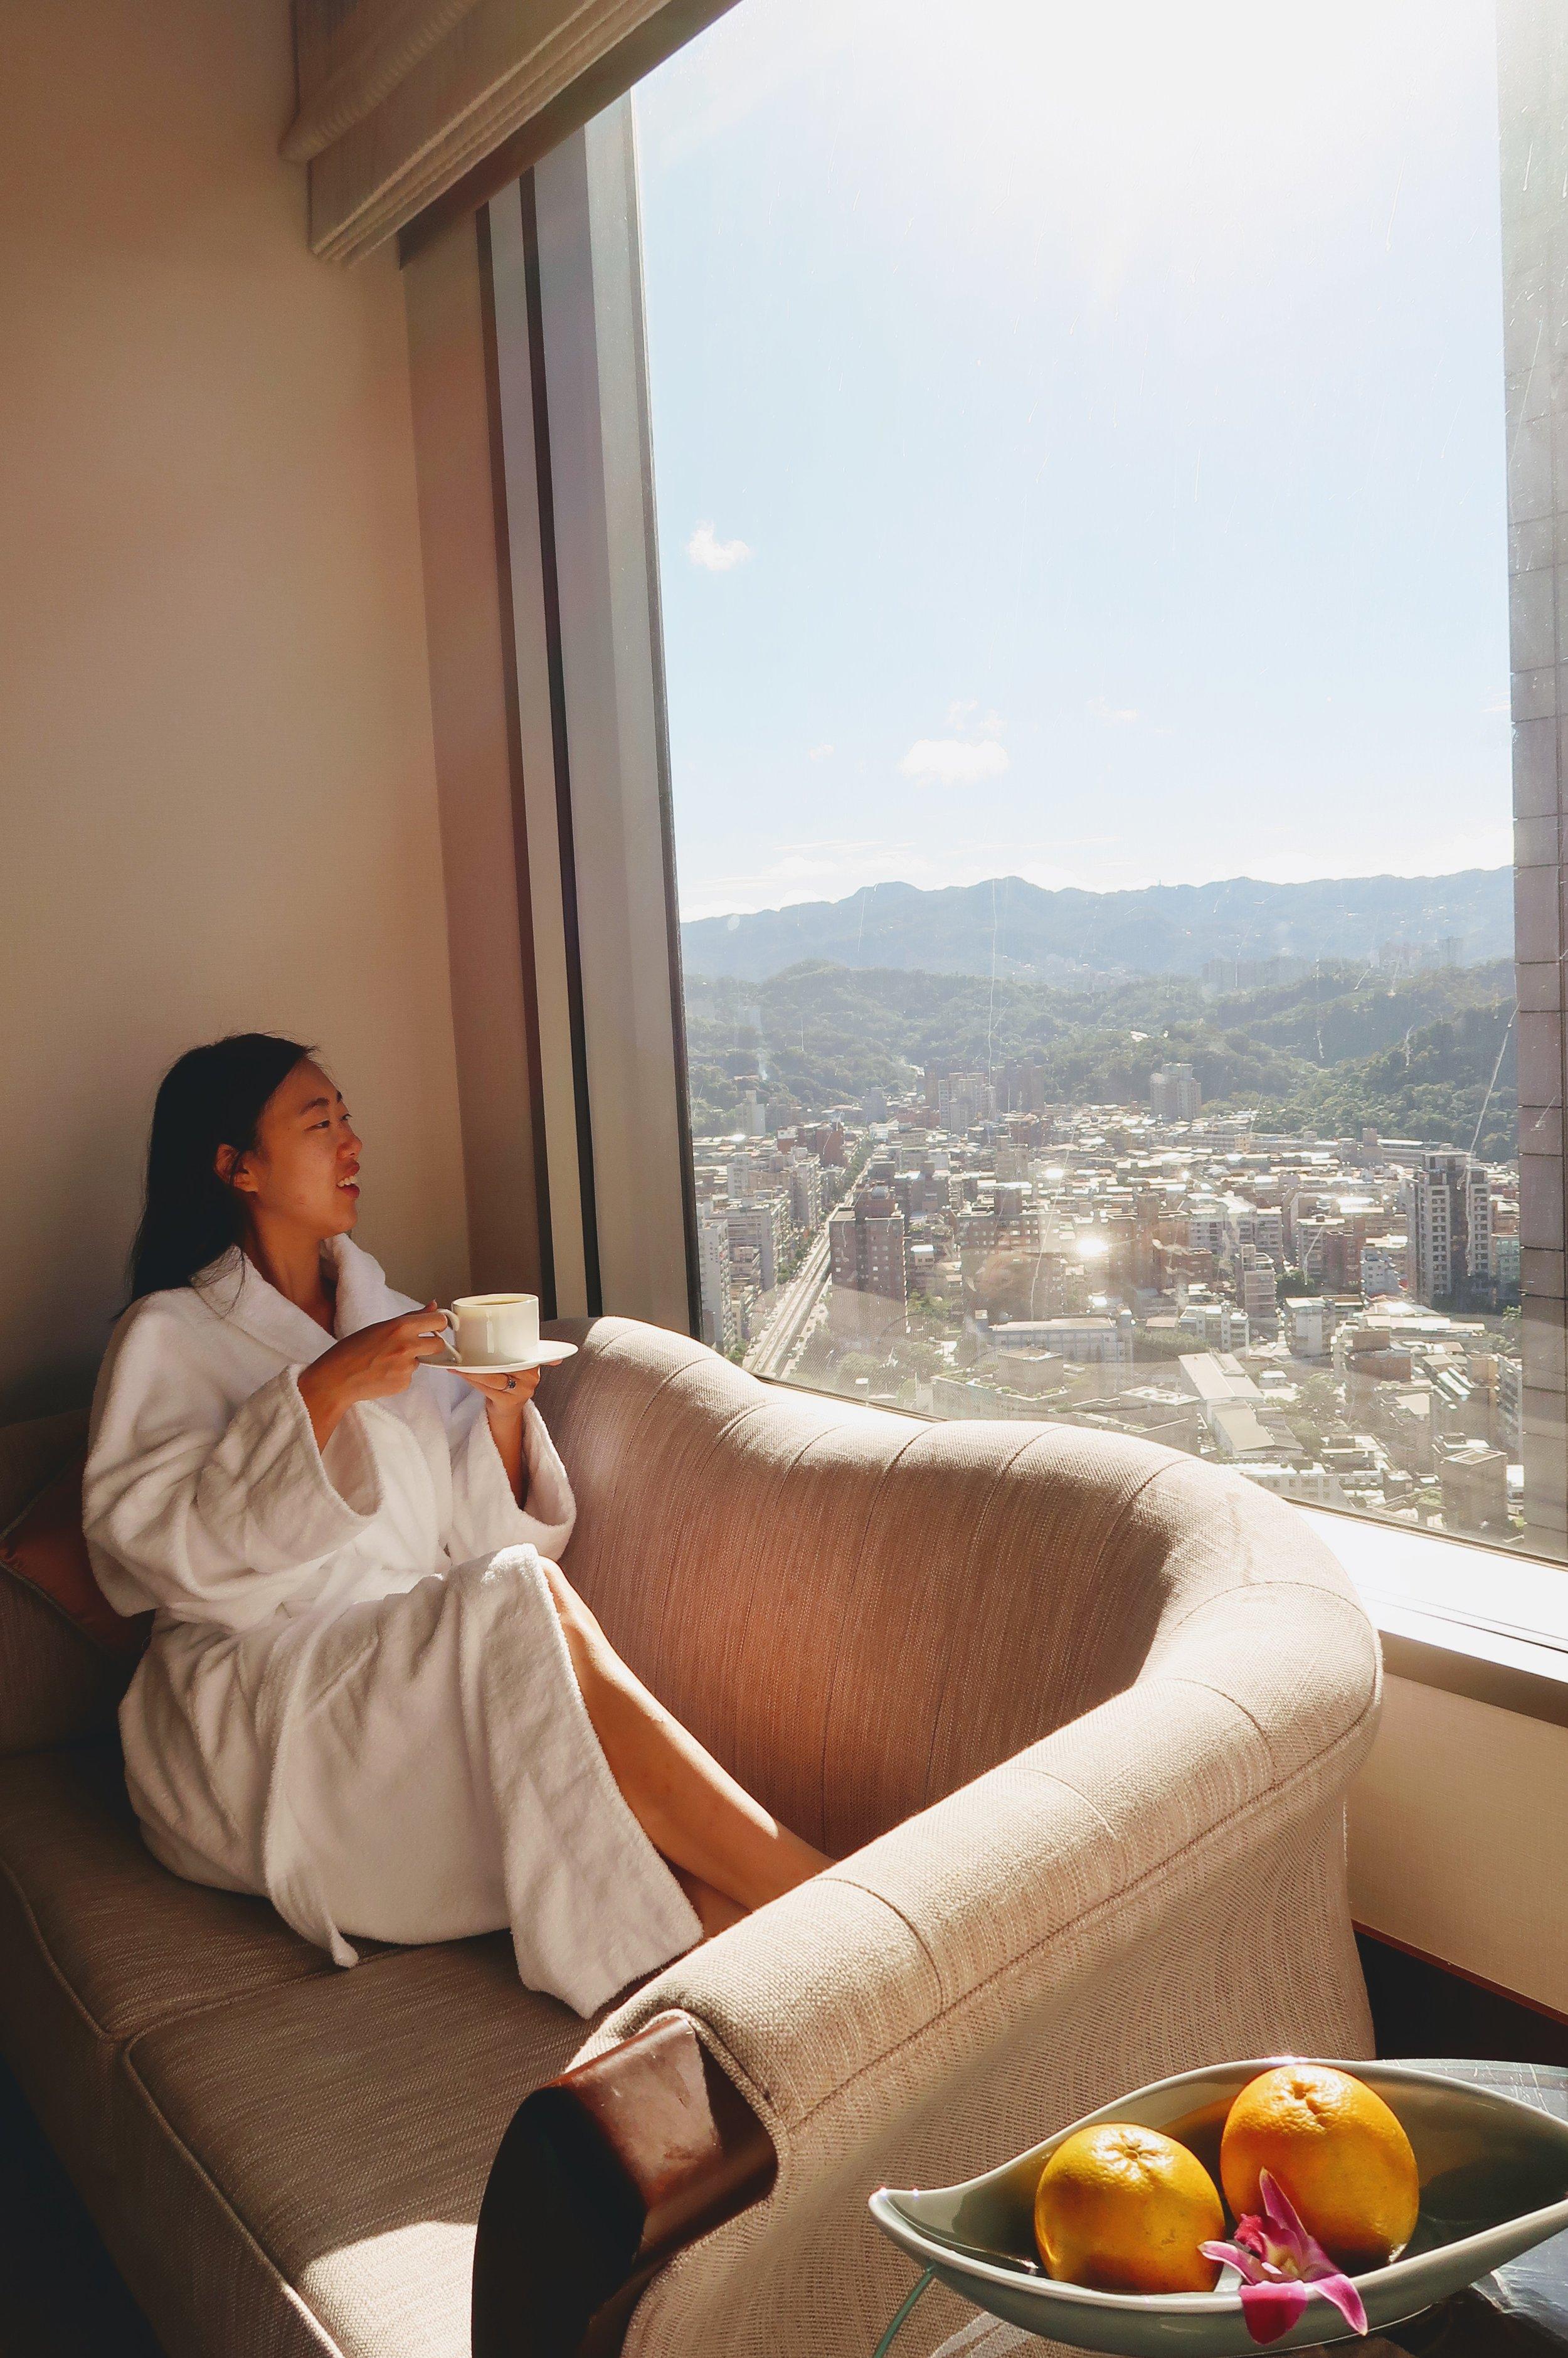 shangri-la-taipei-room-view